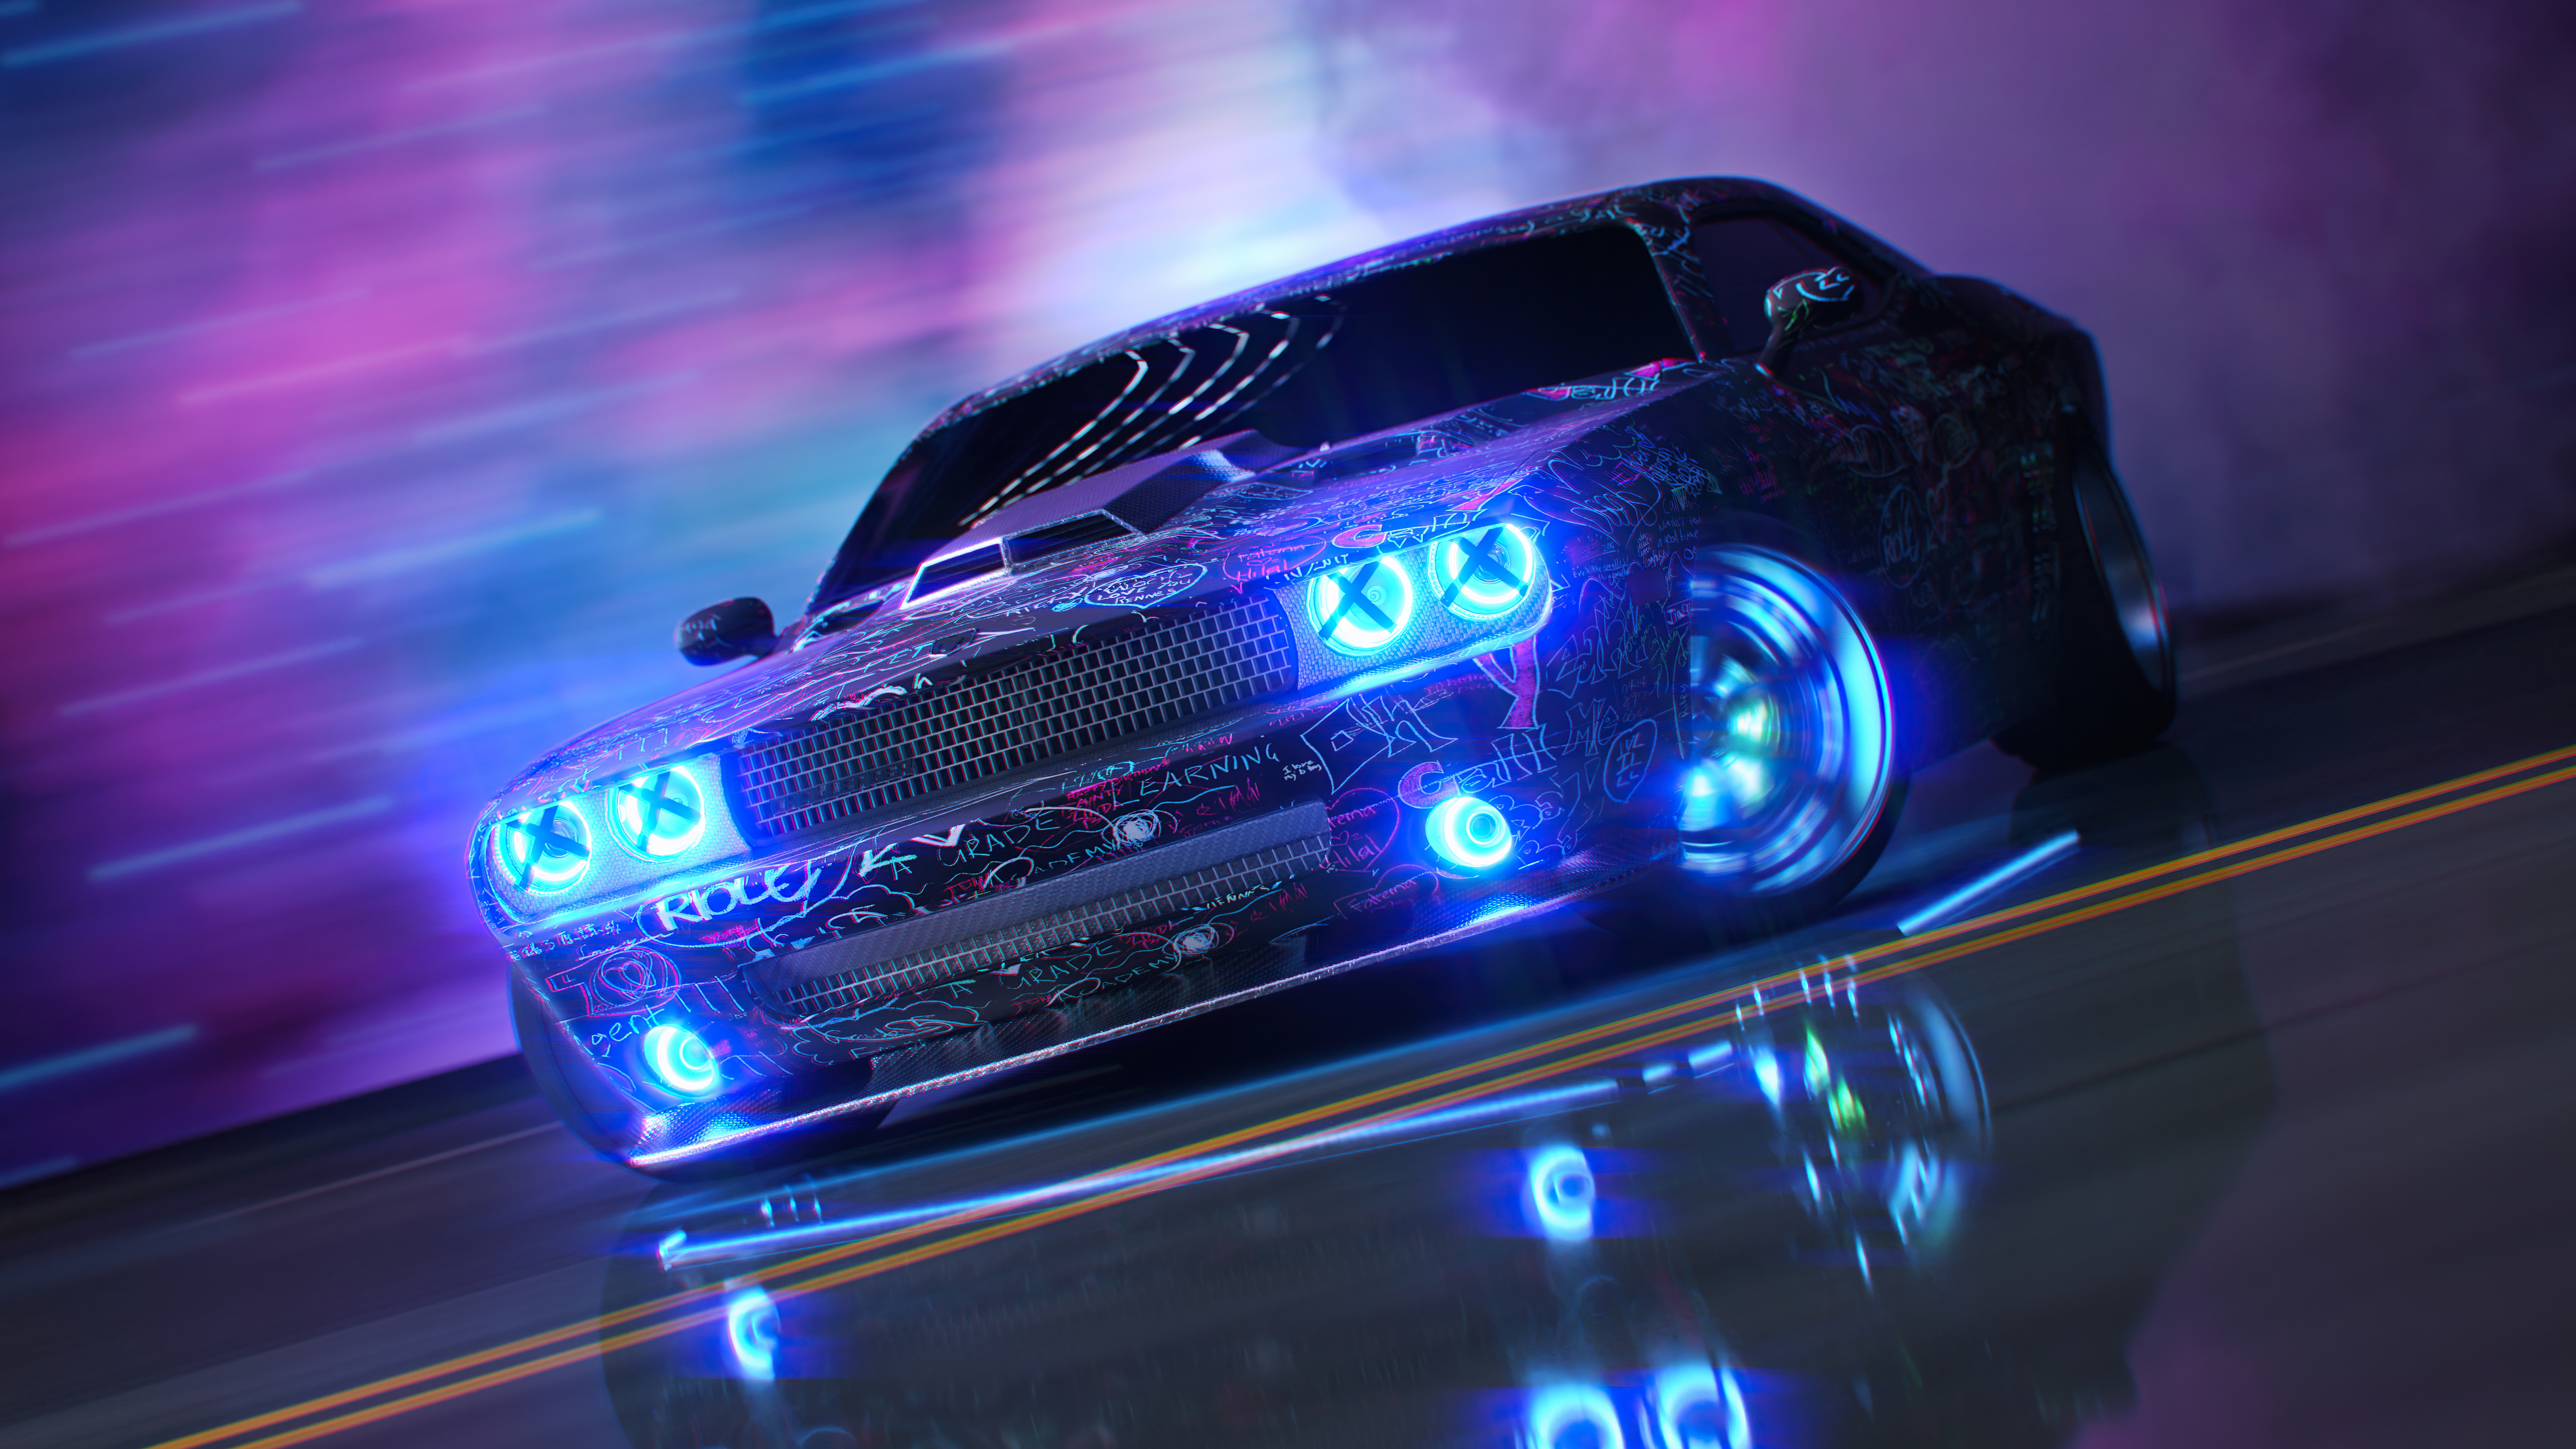 dodge challenger neon ride 4k 1618920903 - Dodge Challenger Neon Ride 4k - Dodge Challenger Neon Ride 4k wallpapers